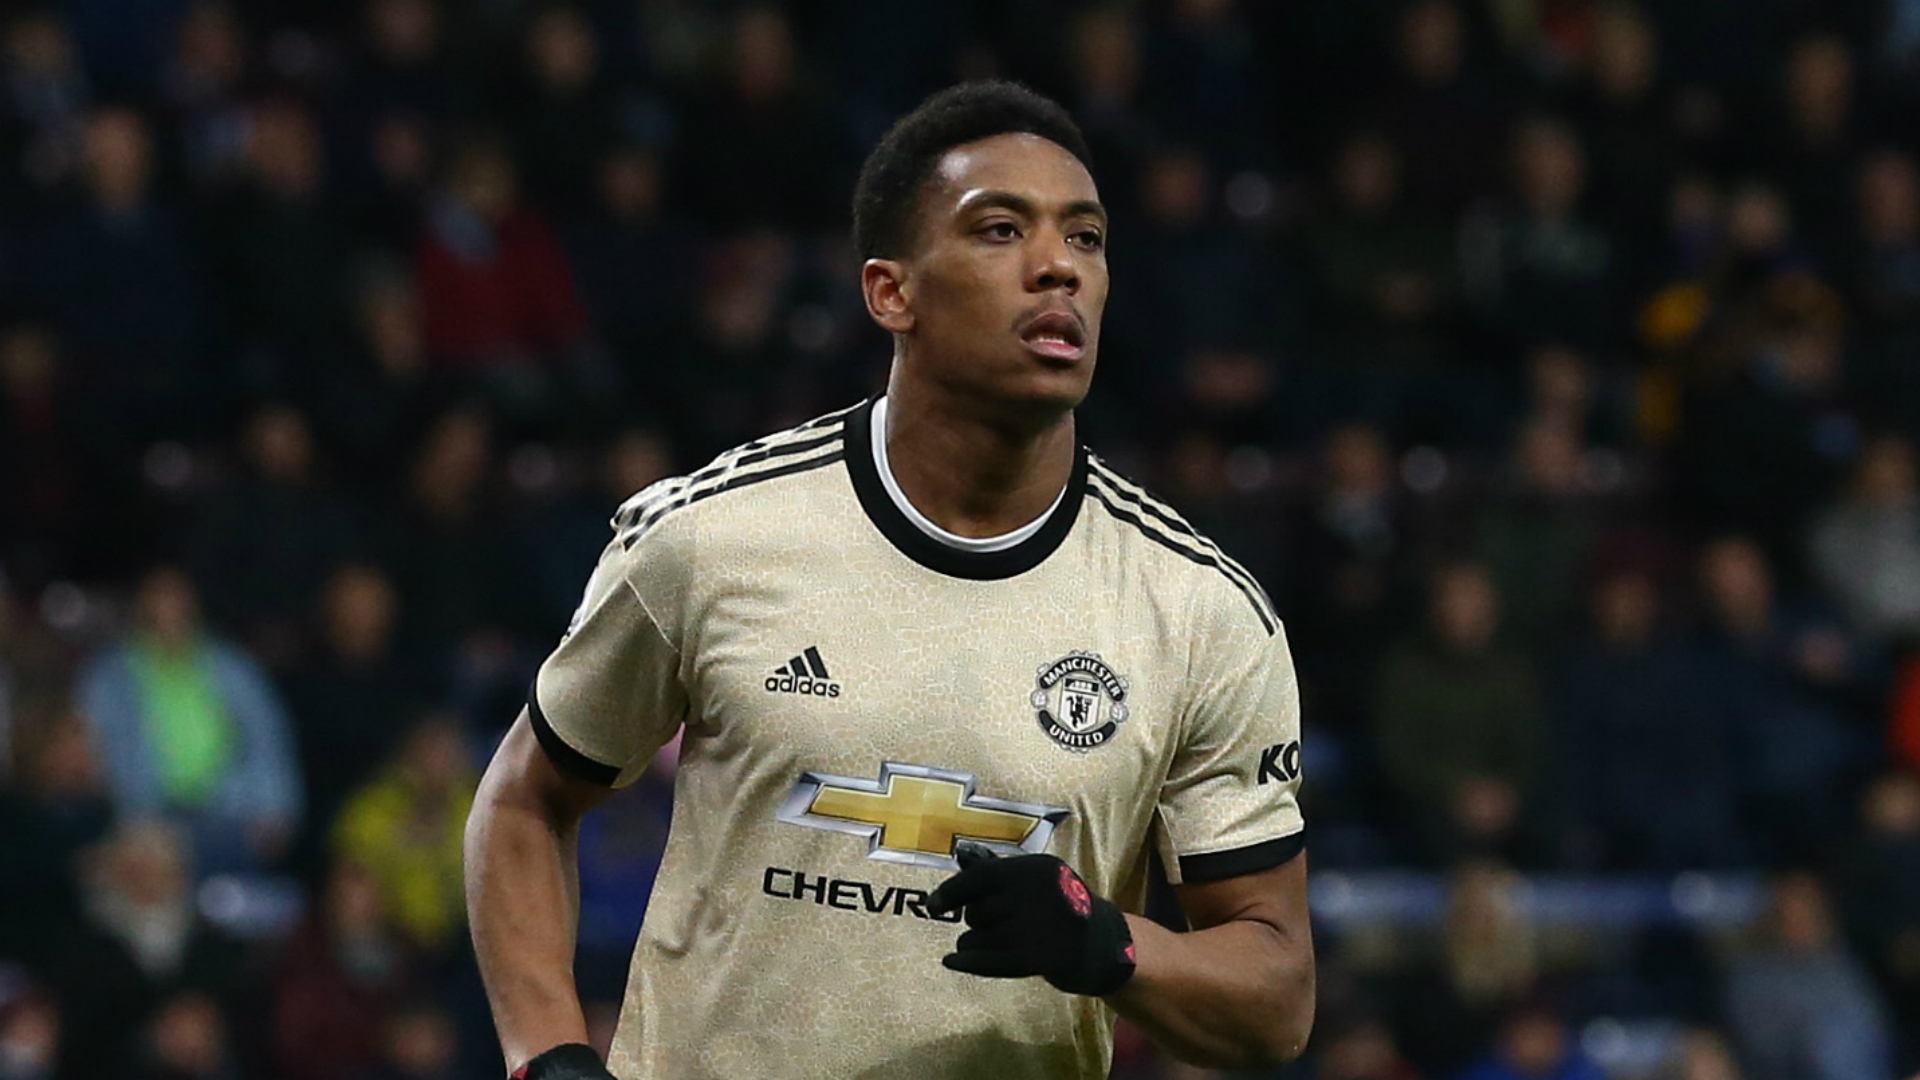 Burnley 0-2 Manchester United: Martial and Rashford send Solskjaer's men fifth